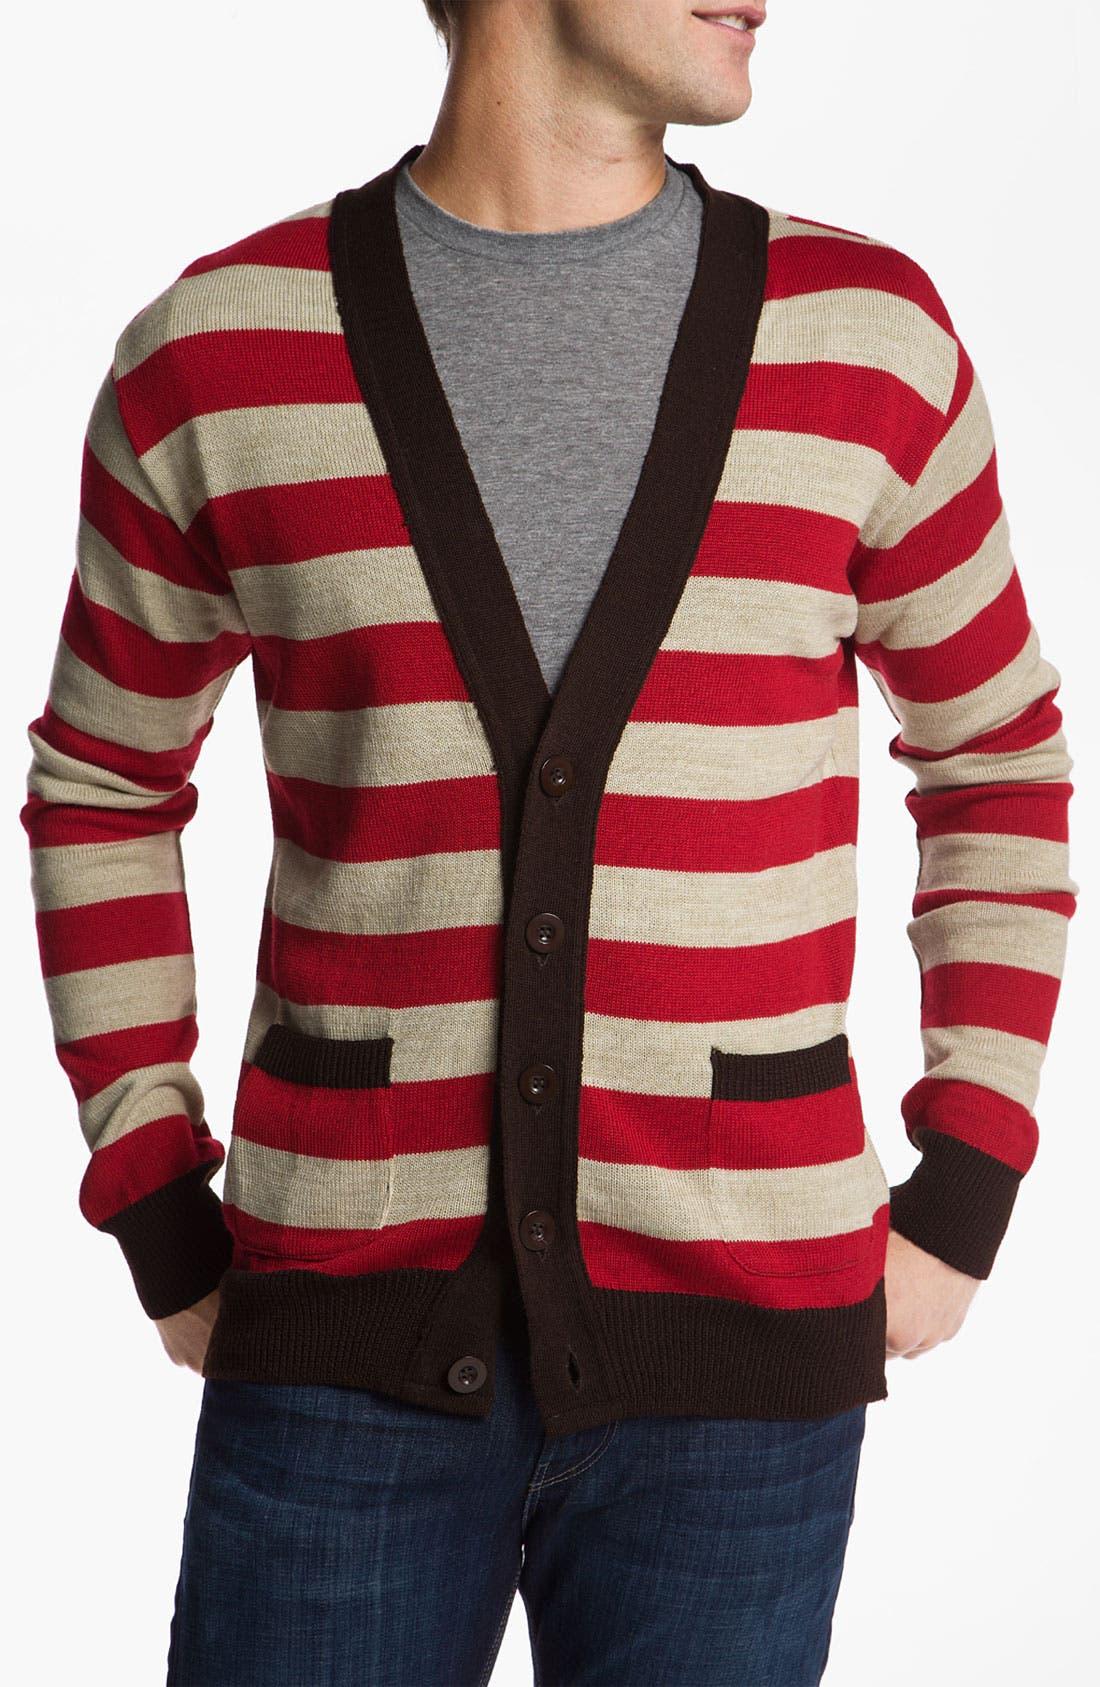 Main Image - Vanguard 'Norbert' Stripe Cardigan